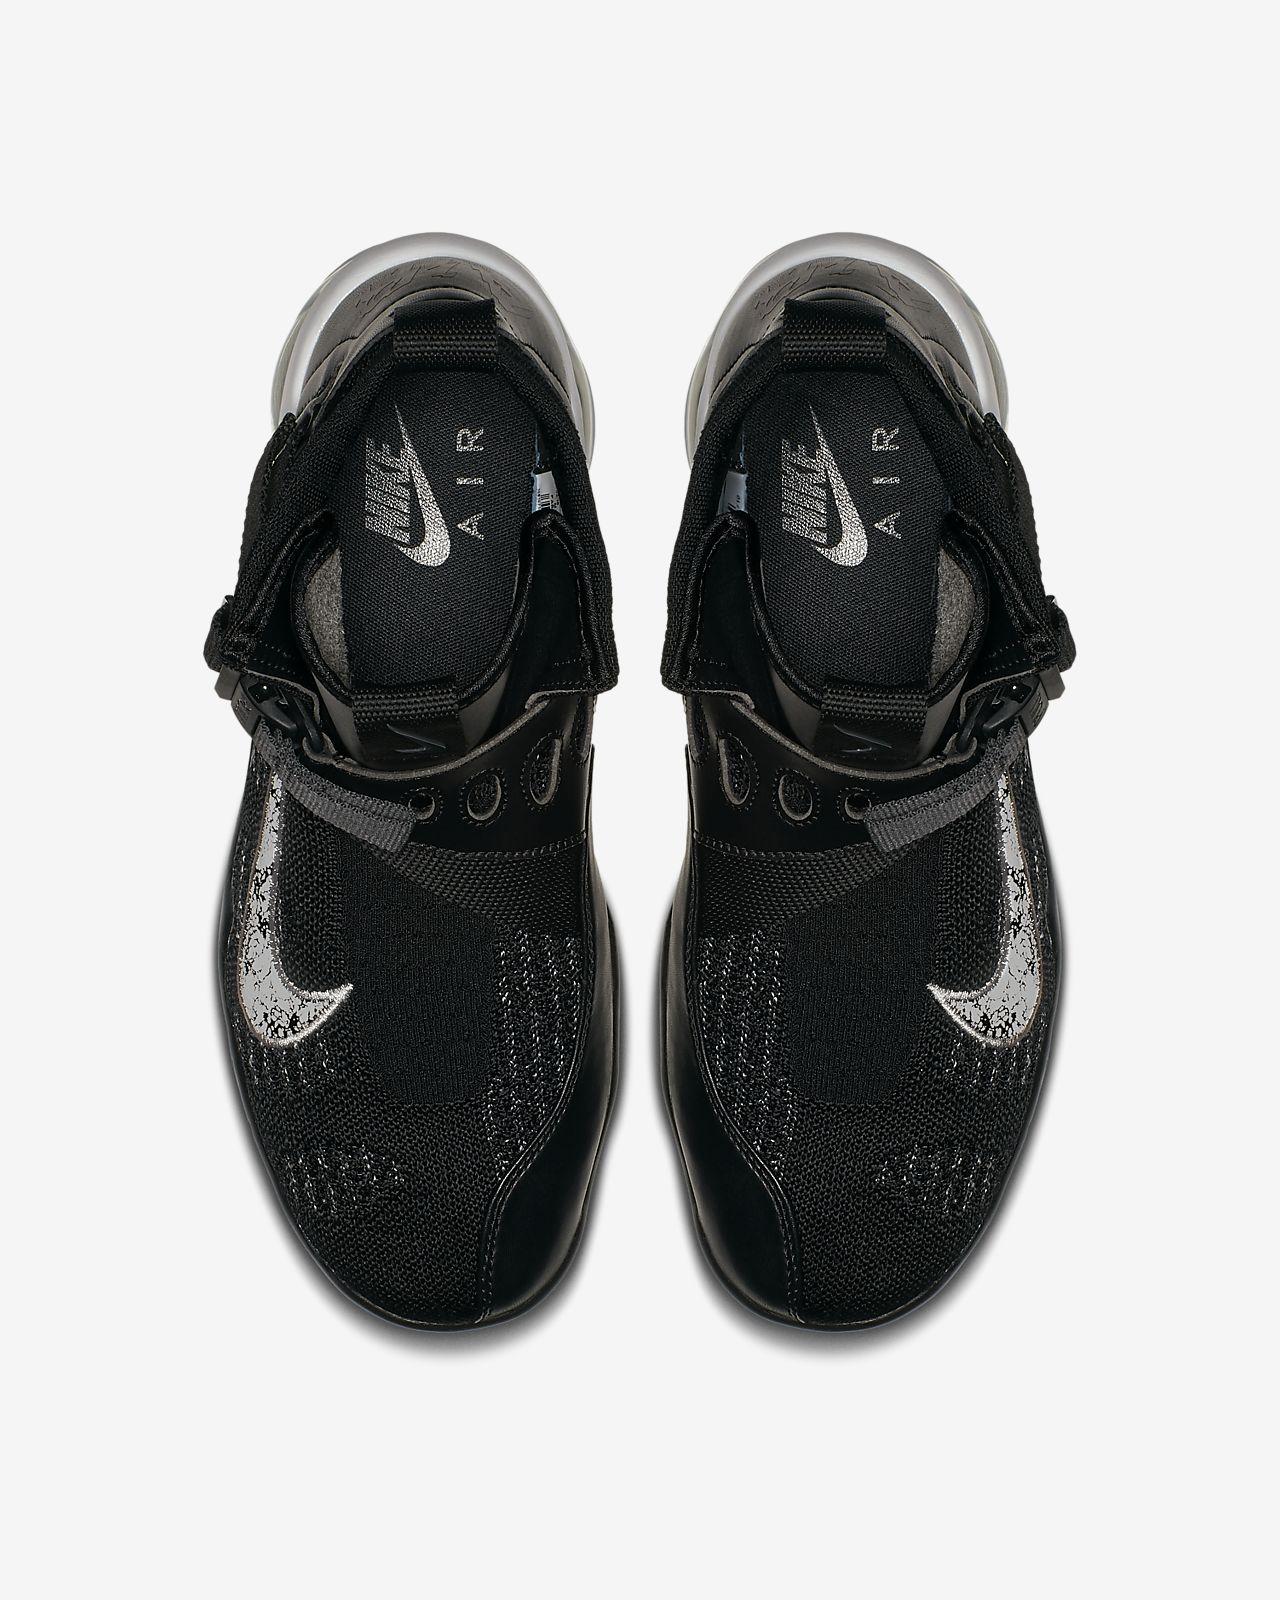 e4896a696f38 Nike Air VaporMax Premier Flyknit Men s Shoe. Nike.com AU